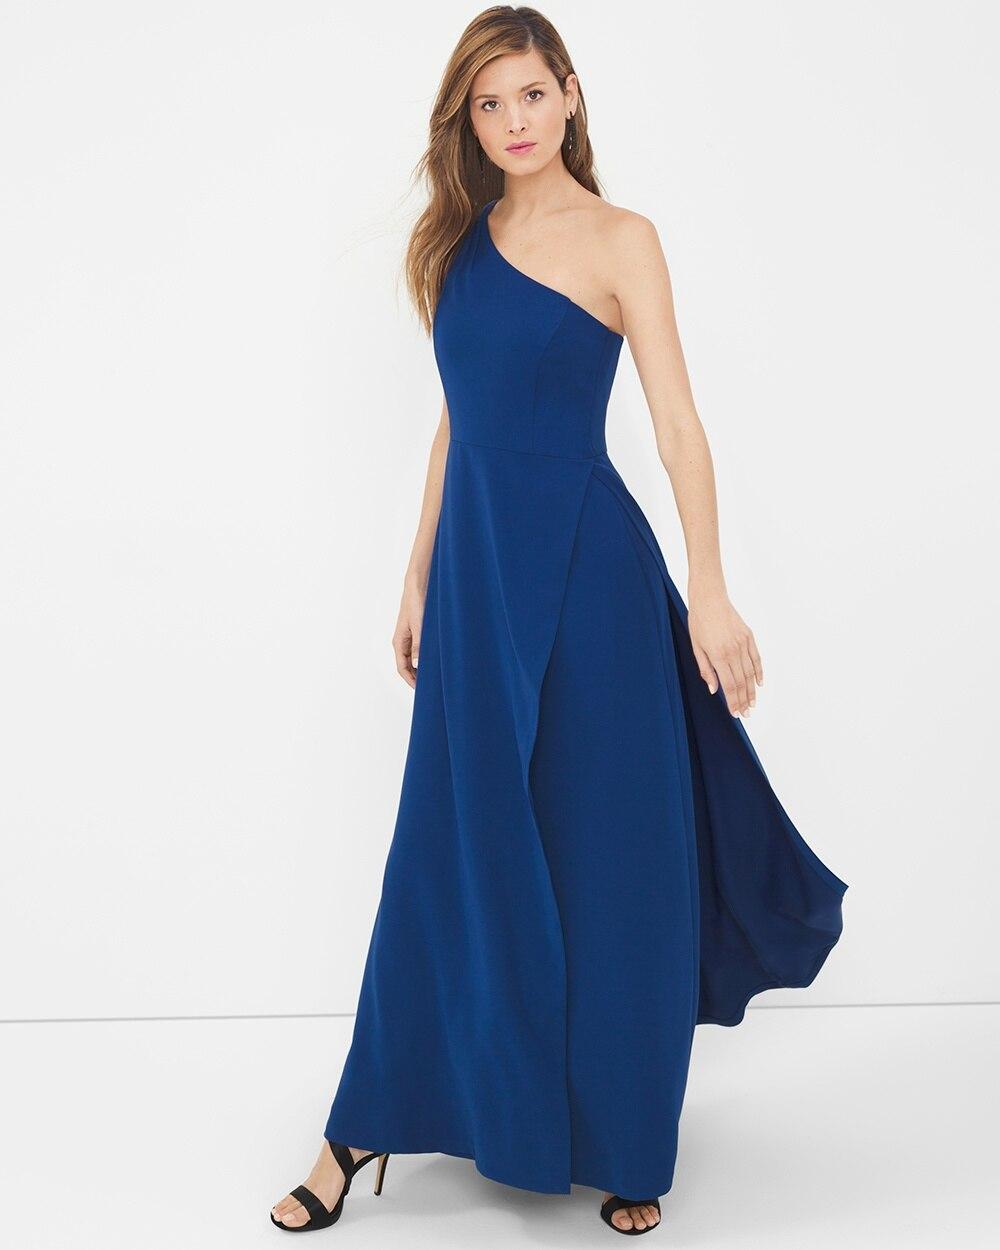 0cb78190e4f9 One-Shoulder Gown - White House Black Market